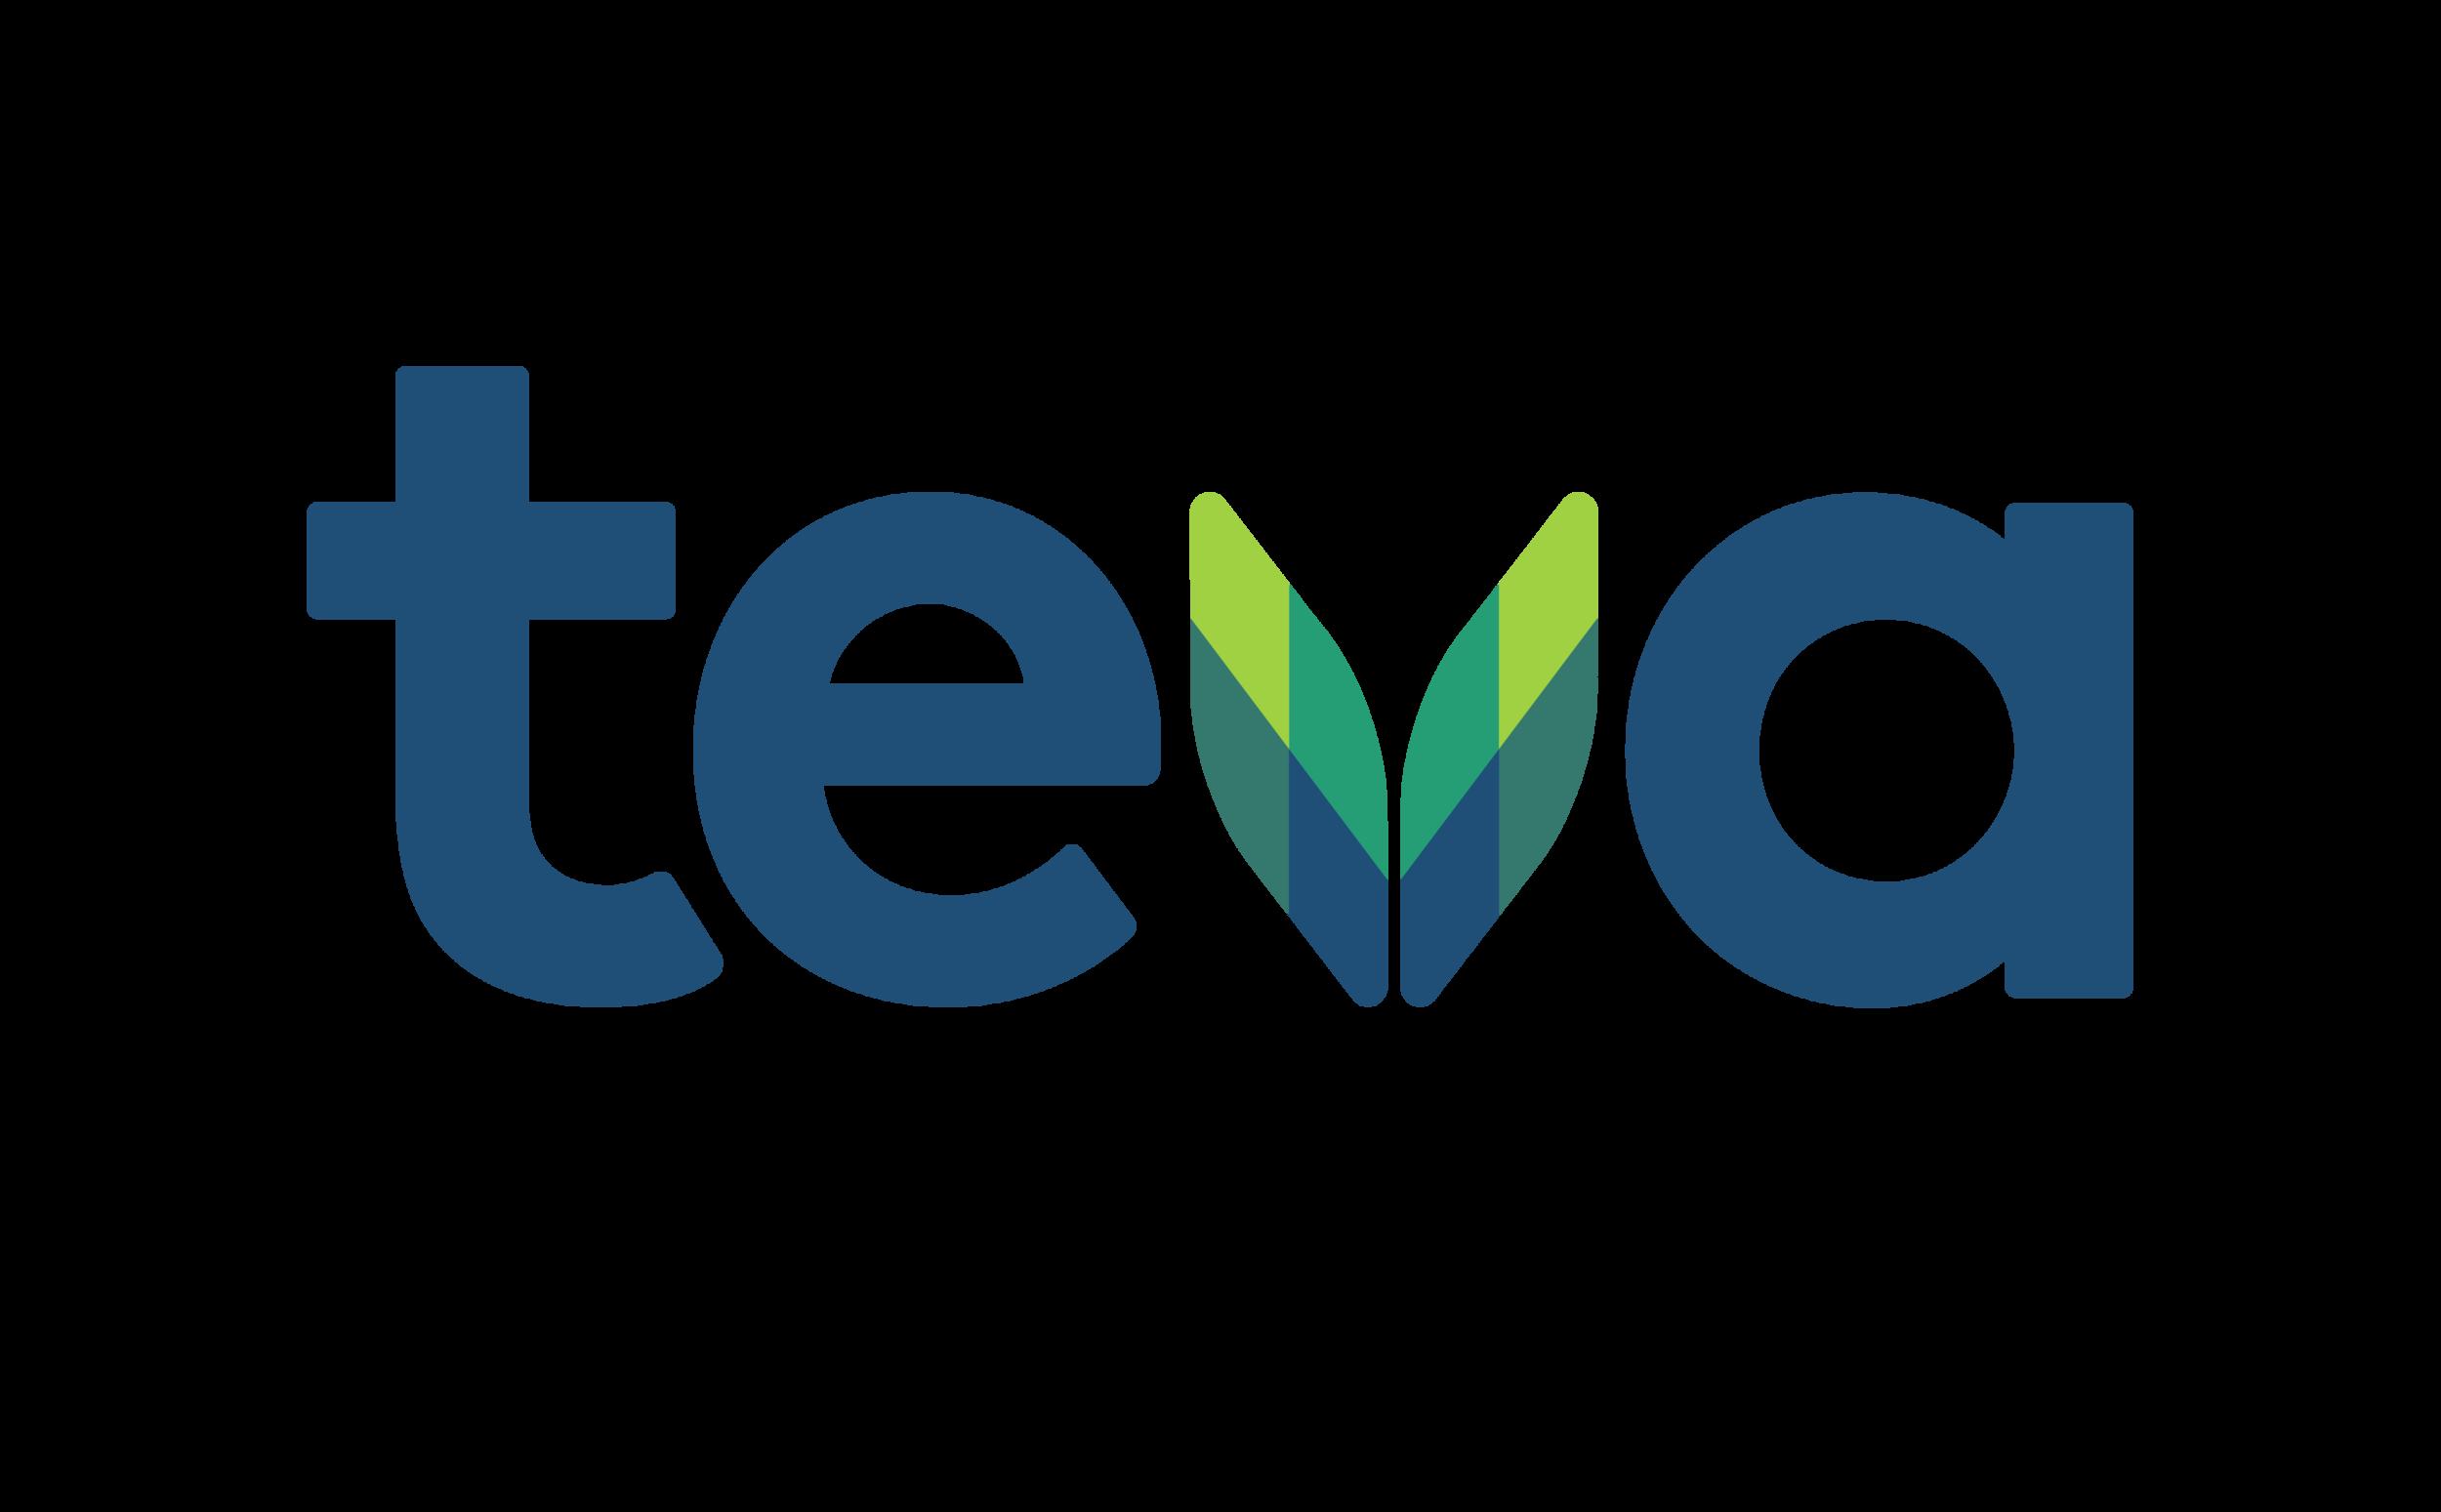 Teva_Pharmaceuticals_logo.png